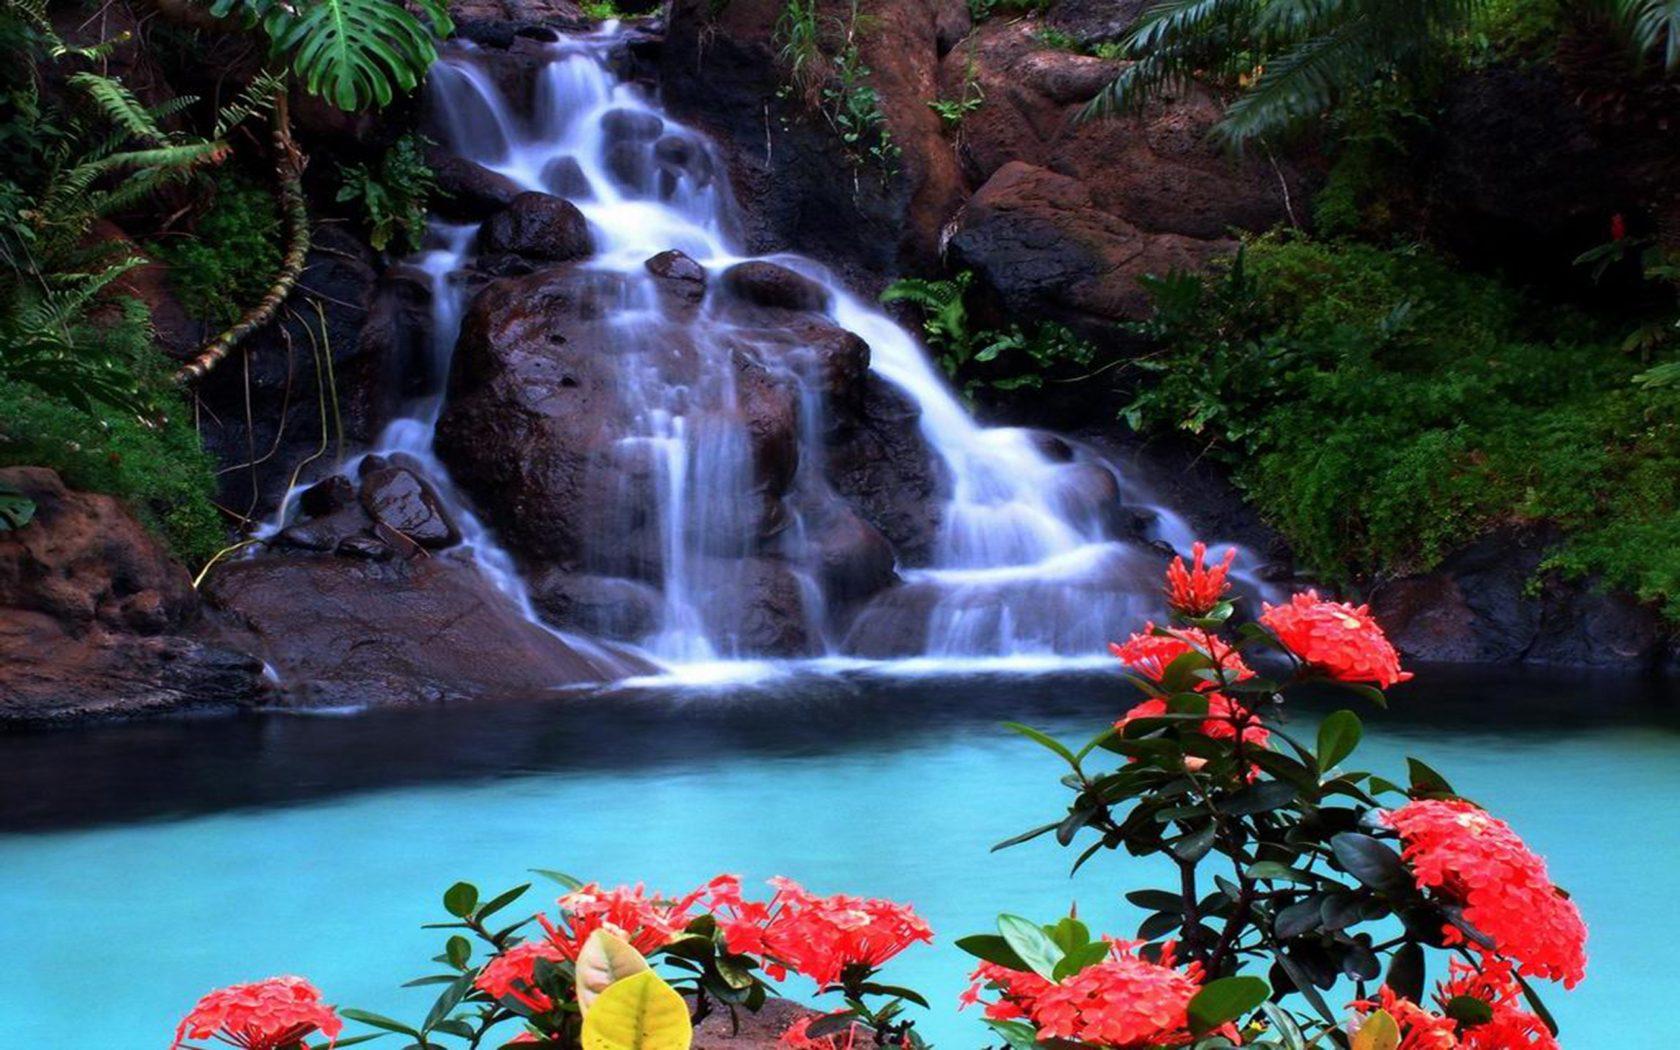 Angel Falls Wallpaper Tropical Waterfall Wallpaper Wallpapers13 Com